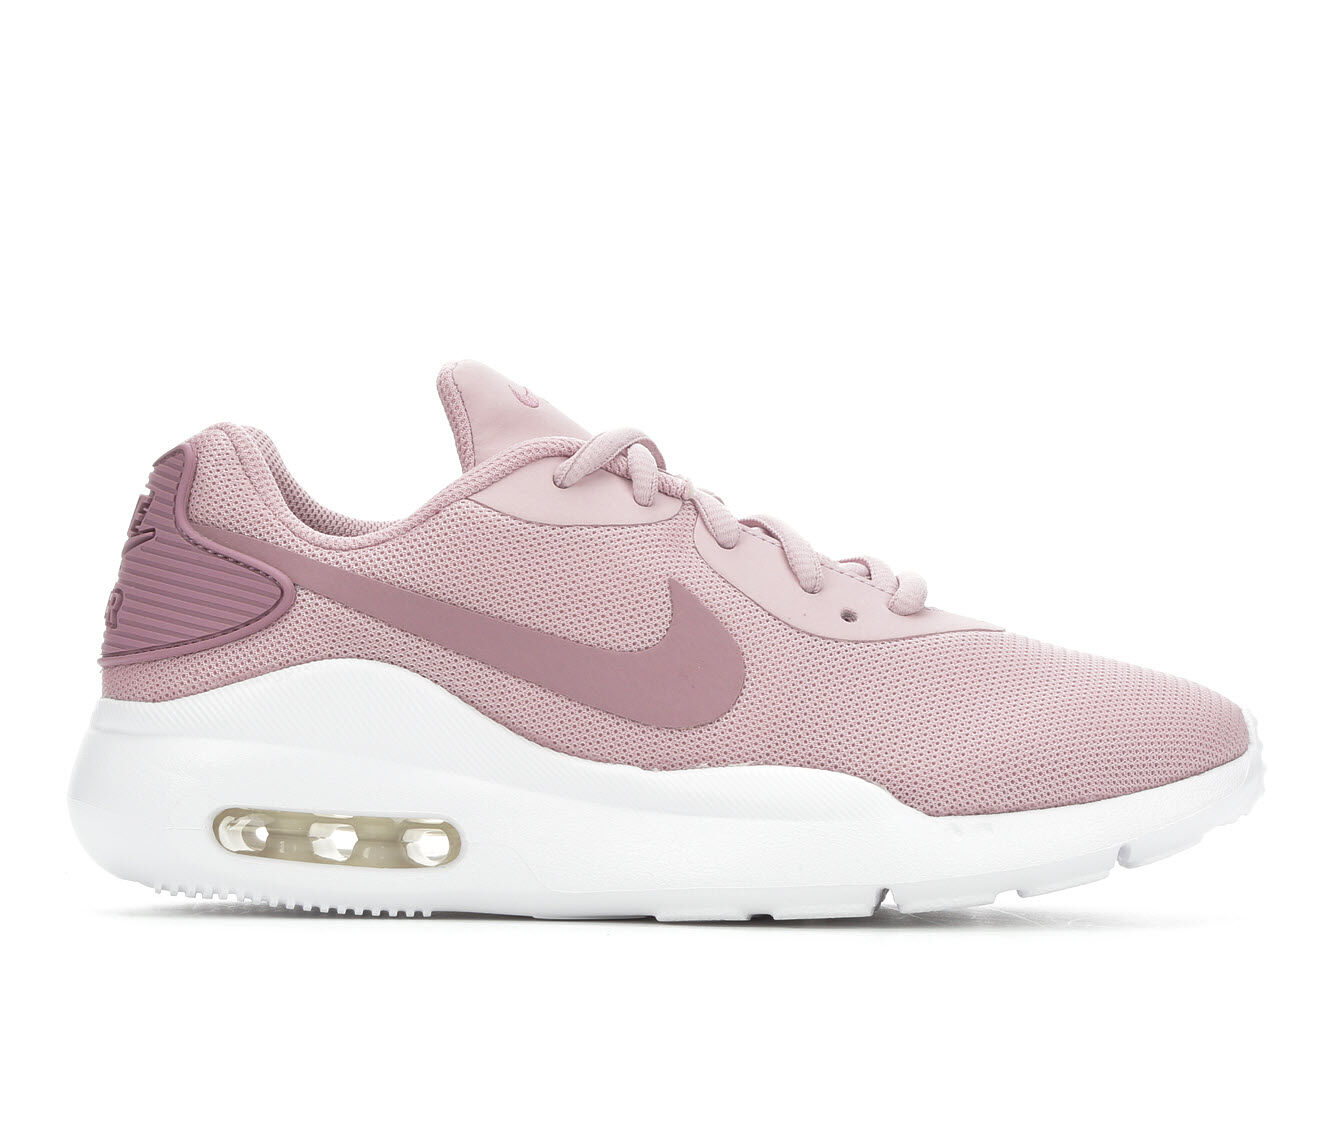 Women's Nike Air Max Oketo Sneakers Plum/Wht 500